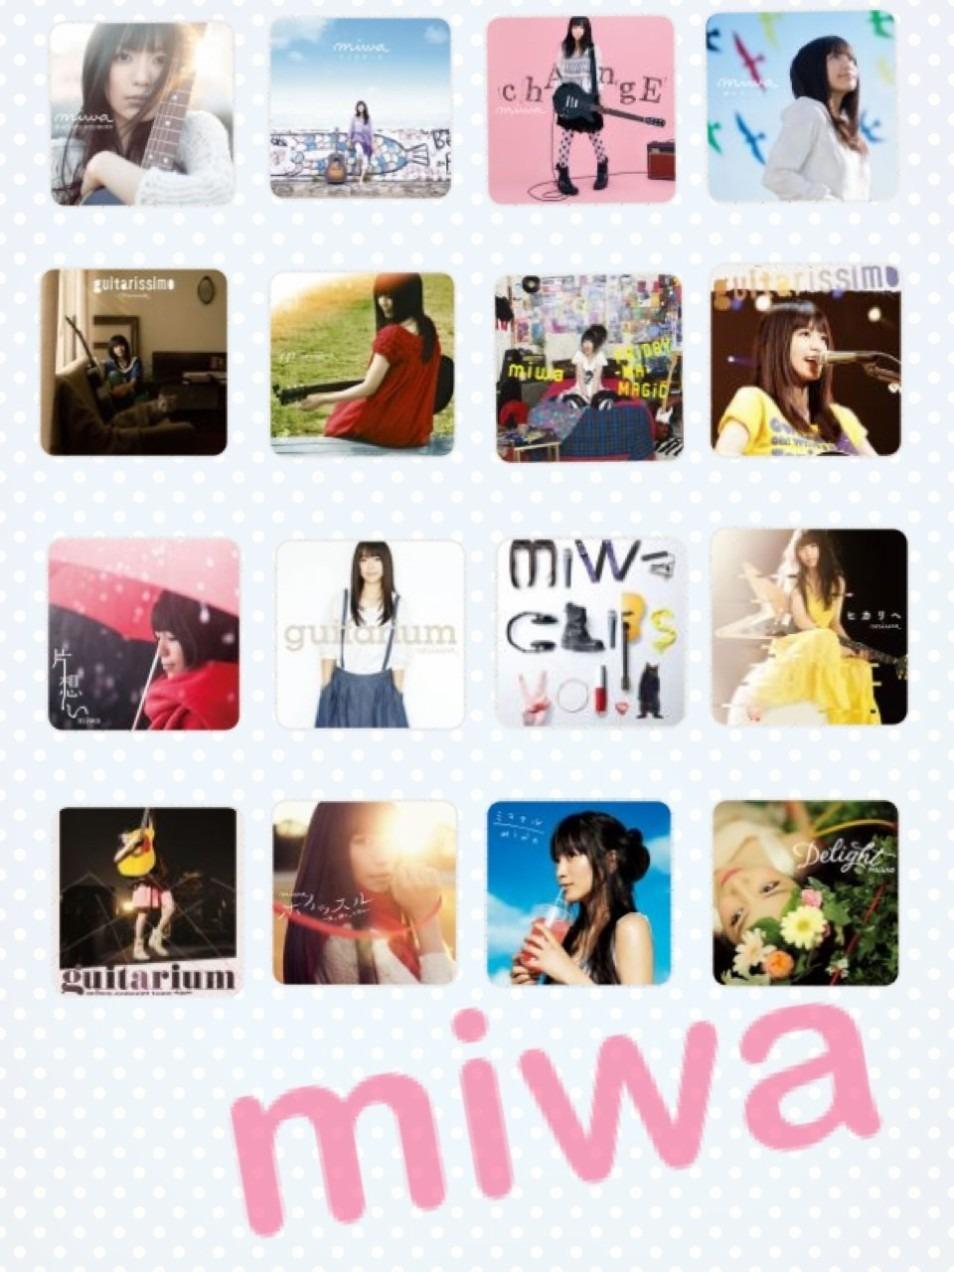 Miwa Iphone 壁紙 完全無料画像検索のプリ画像 Bygmo